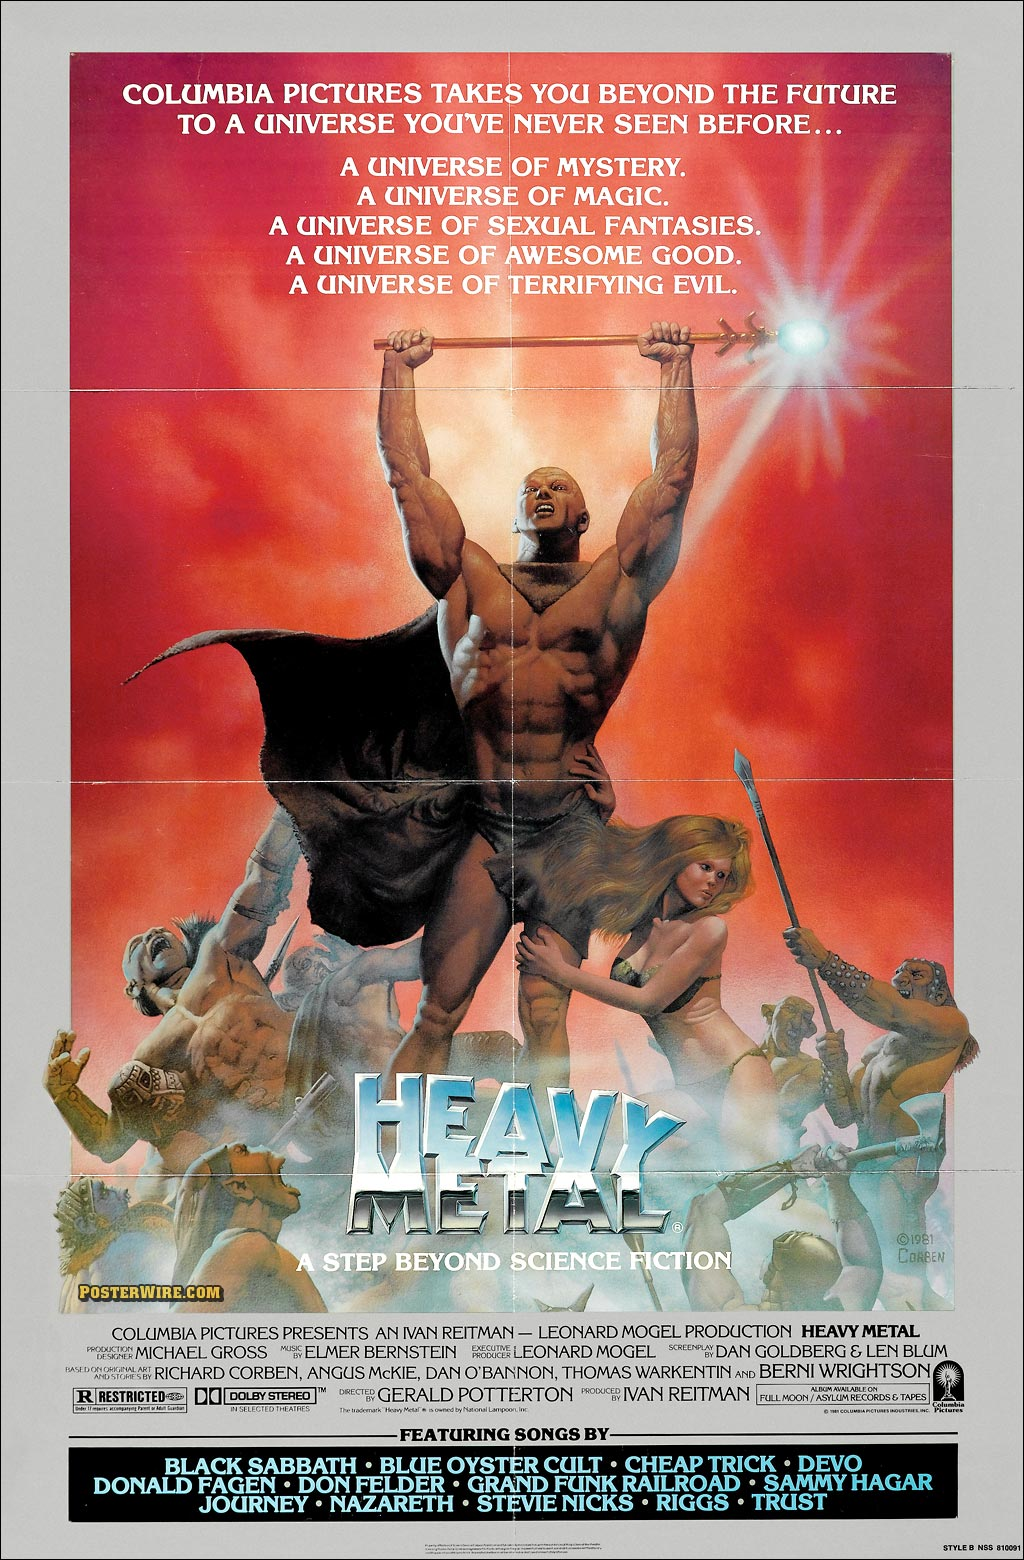 http://2.bp.blogspot.com/_HorjEQjvRCE/TMWn57XAm_I/AAAAAAAAAfs/jdRWWlEhOfI/s1600/heavy_metal+poster.jpg